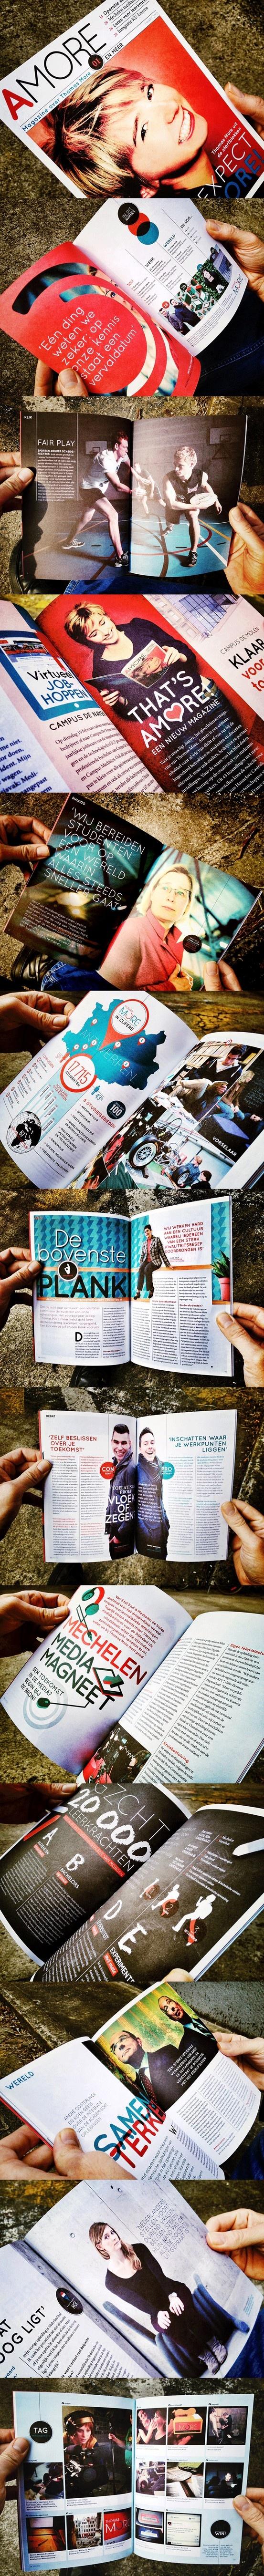 Amore Magazine, Thomas More  Stapel 2013